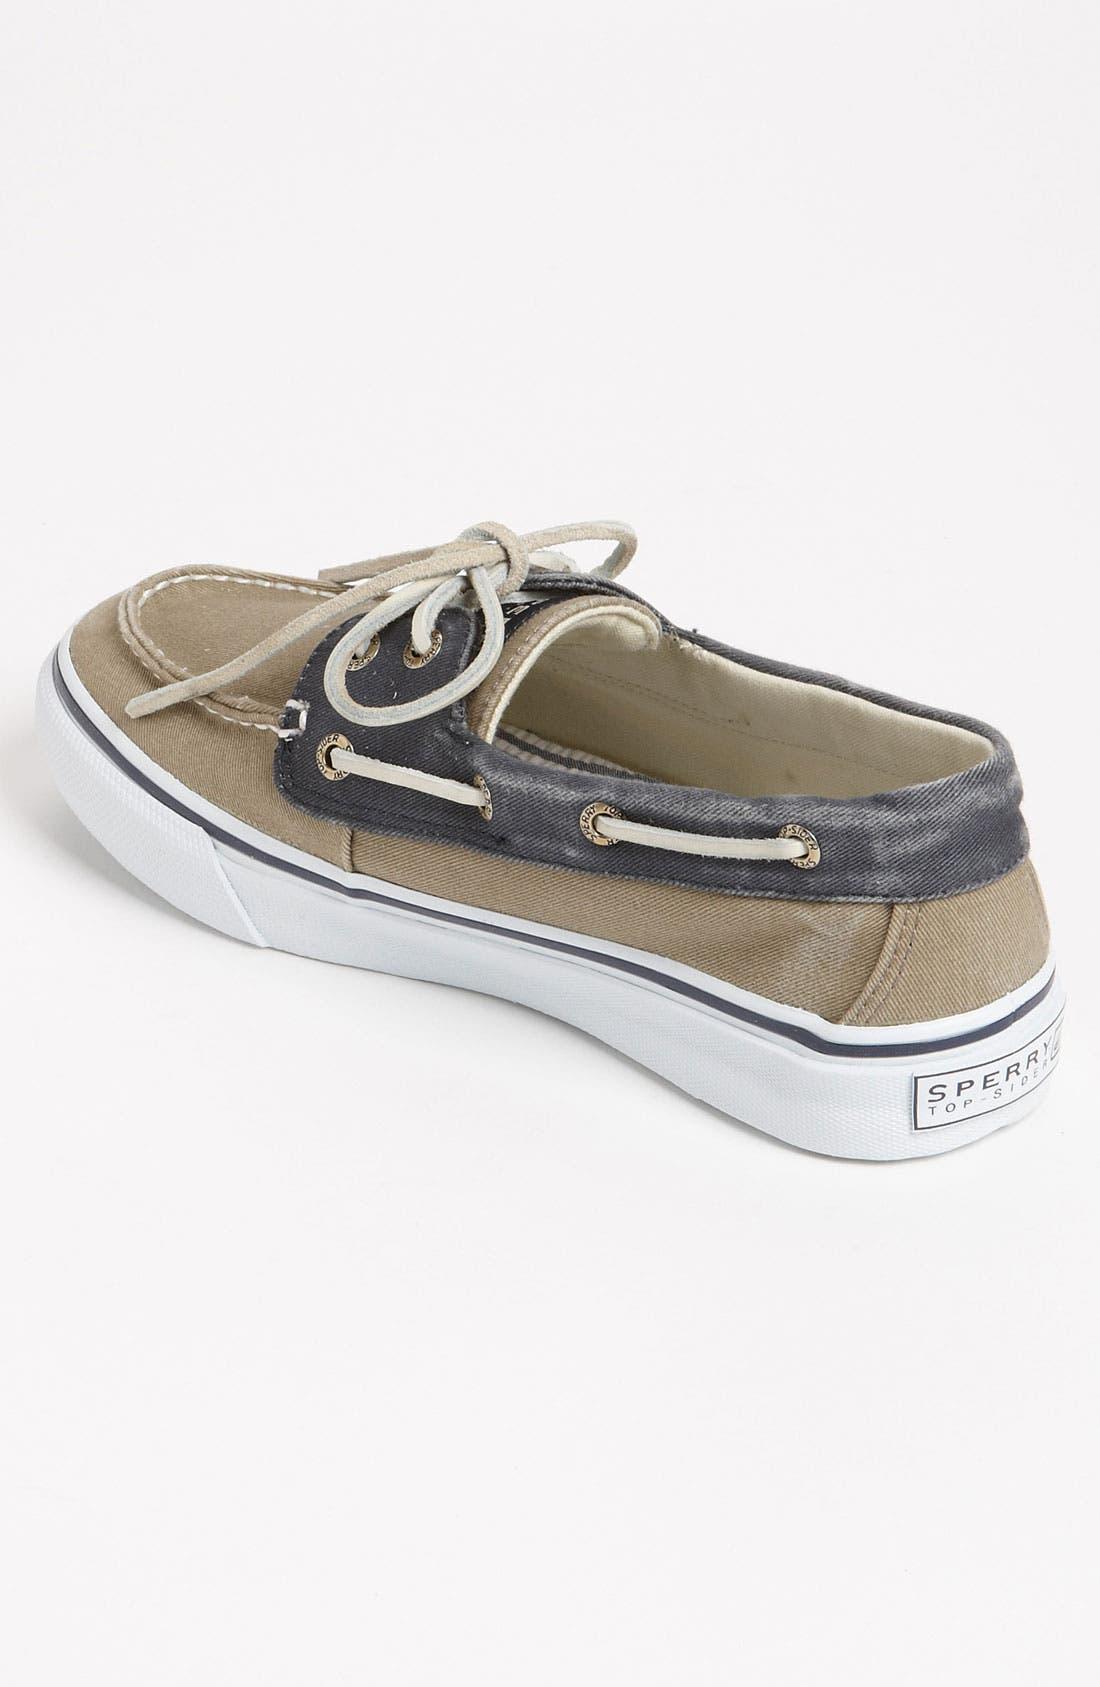 Alternate Image 2  - Sperry Top-Sider® 'Bahama' Boat Shoe